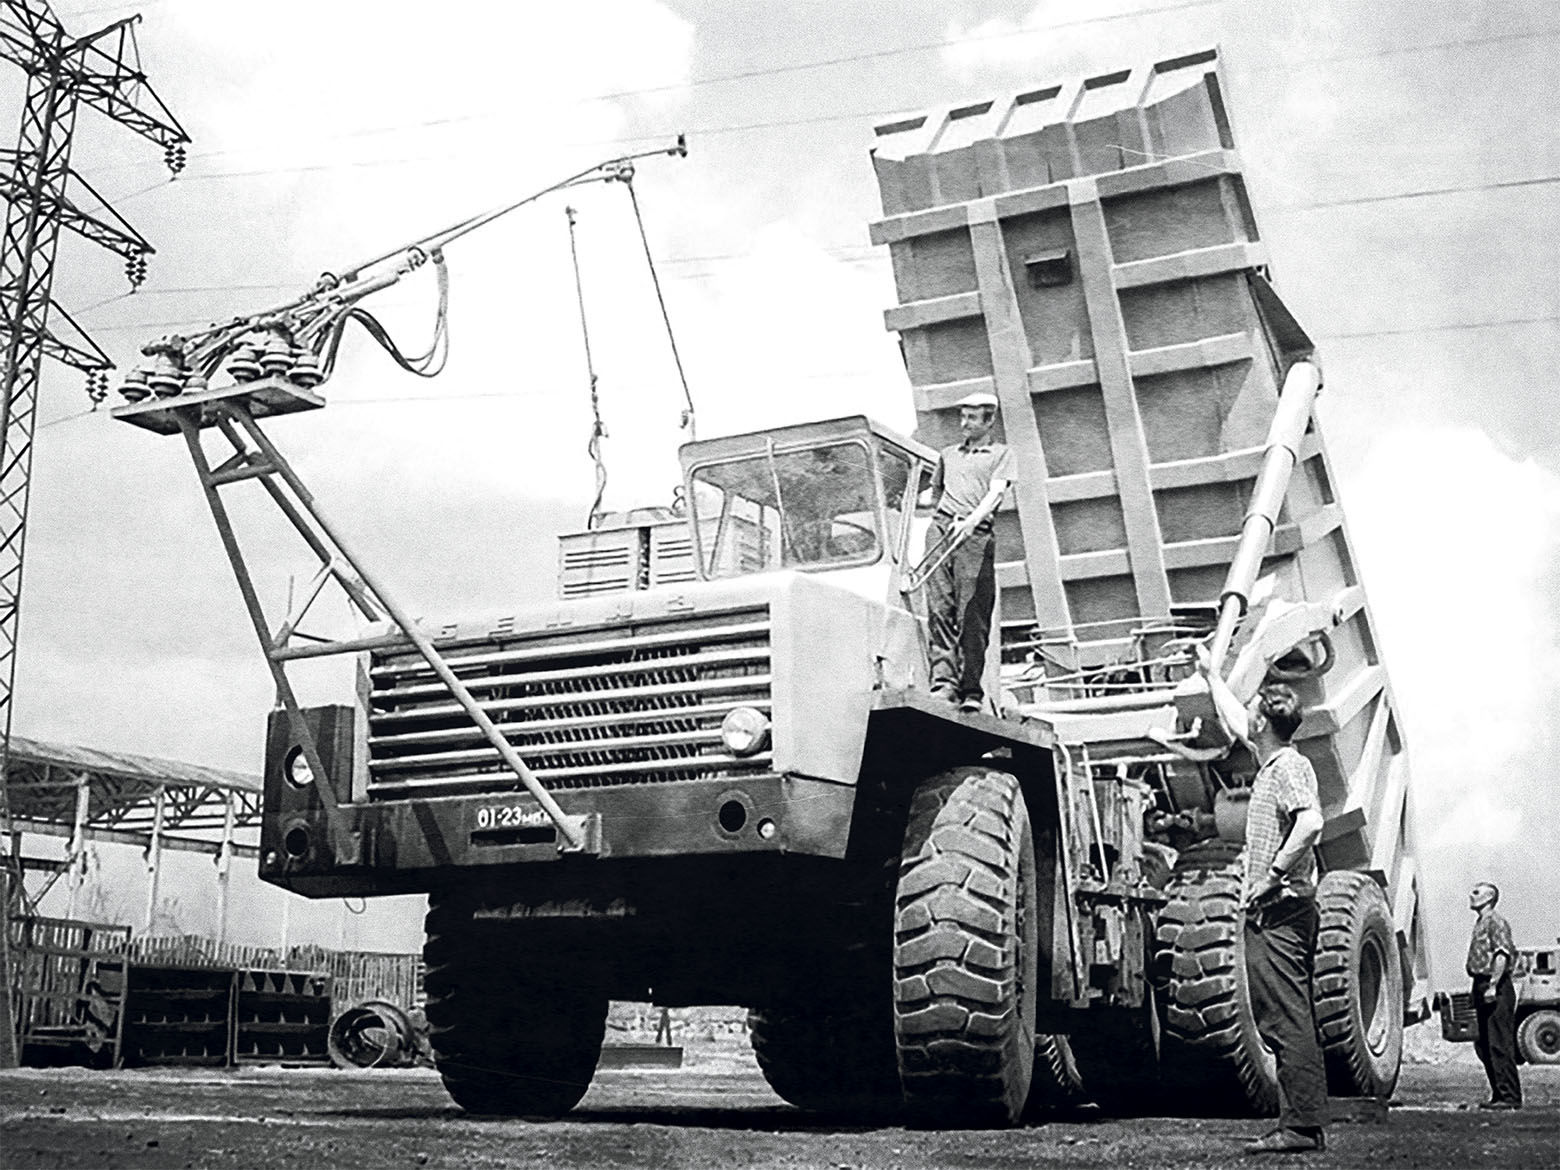 БелАЗ-7524-Э792, Беларусь